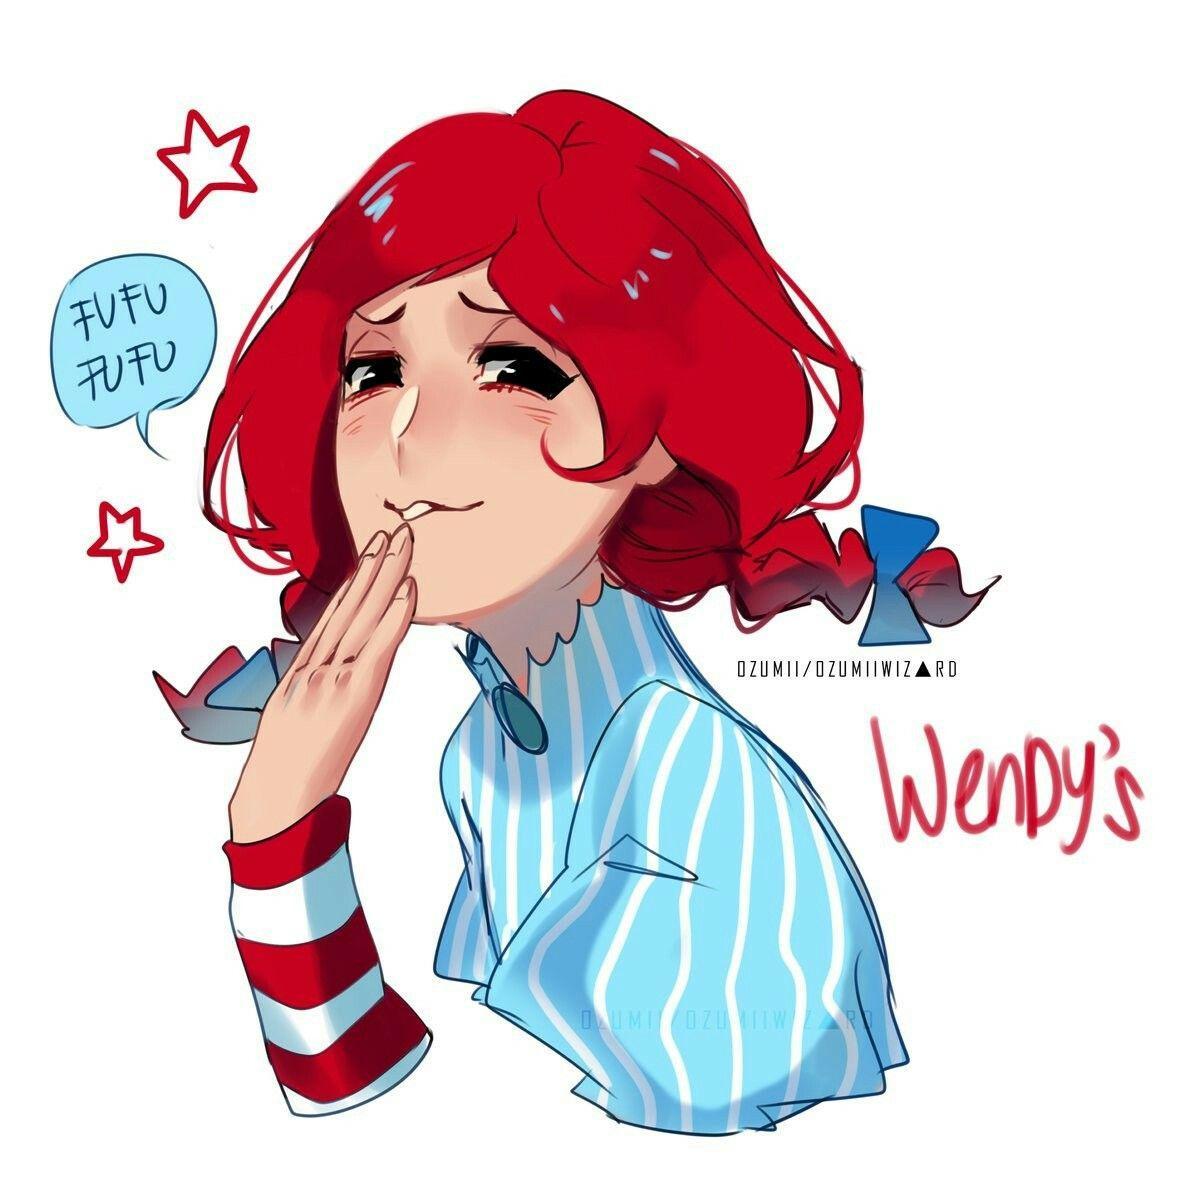 Ozumiiwizard Red Hair Anime Characters Anime Anime Characters